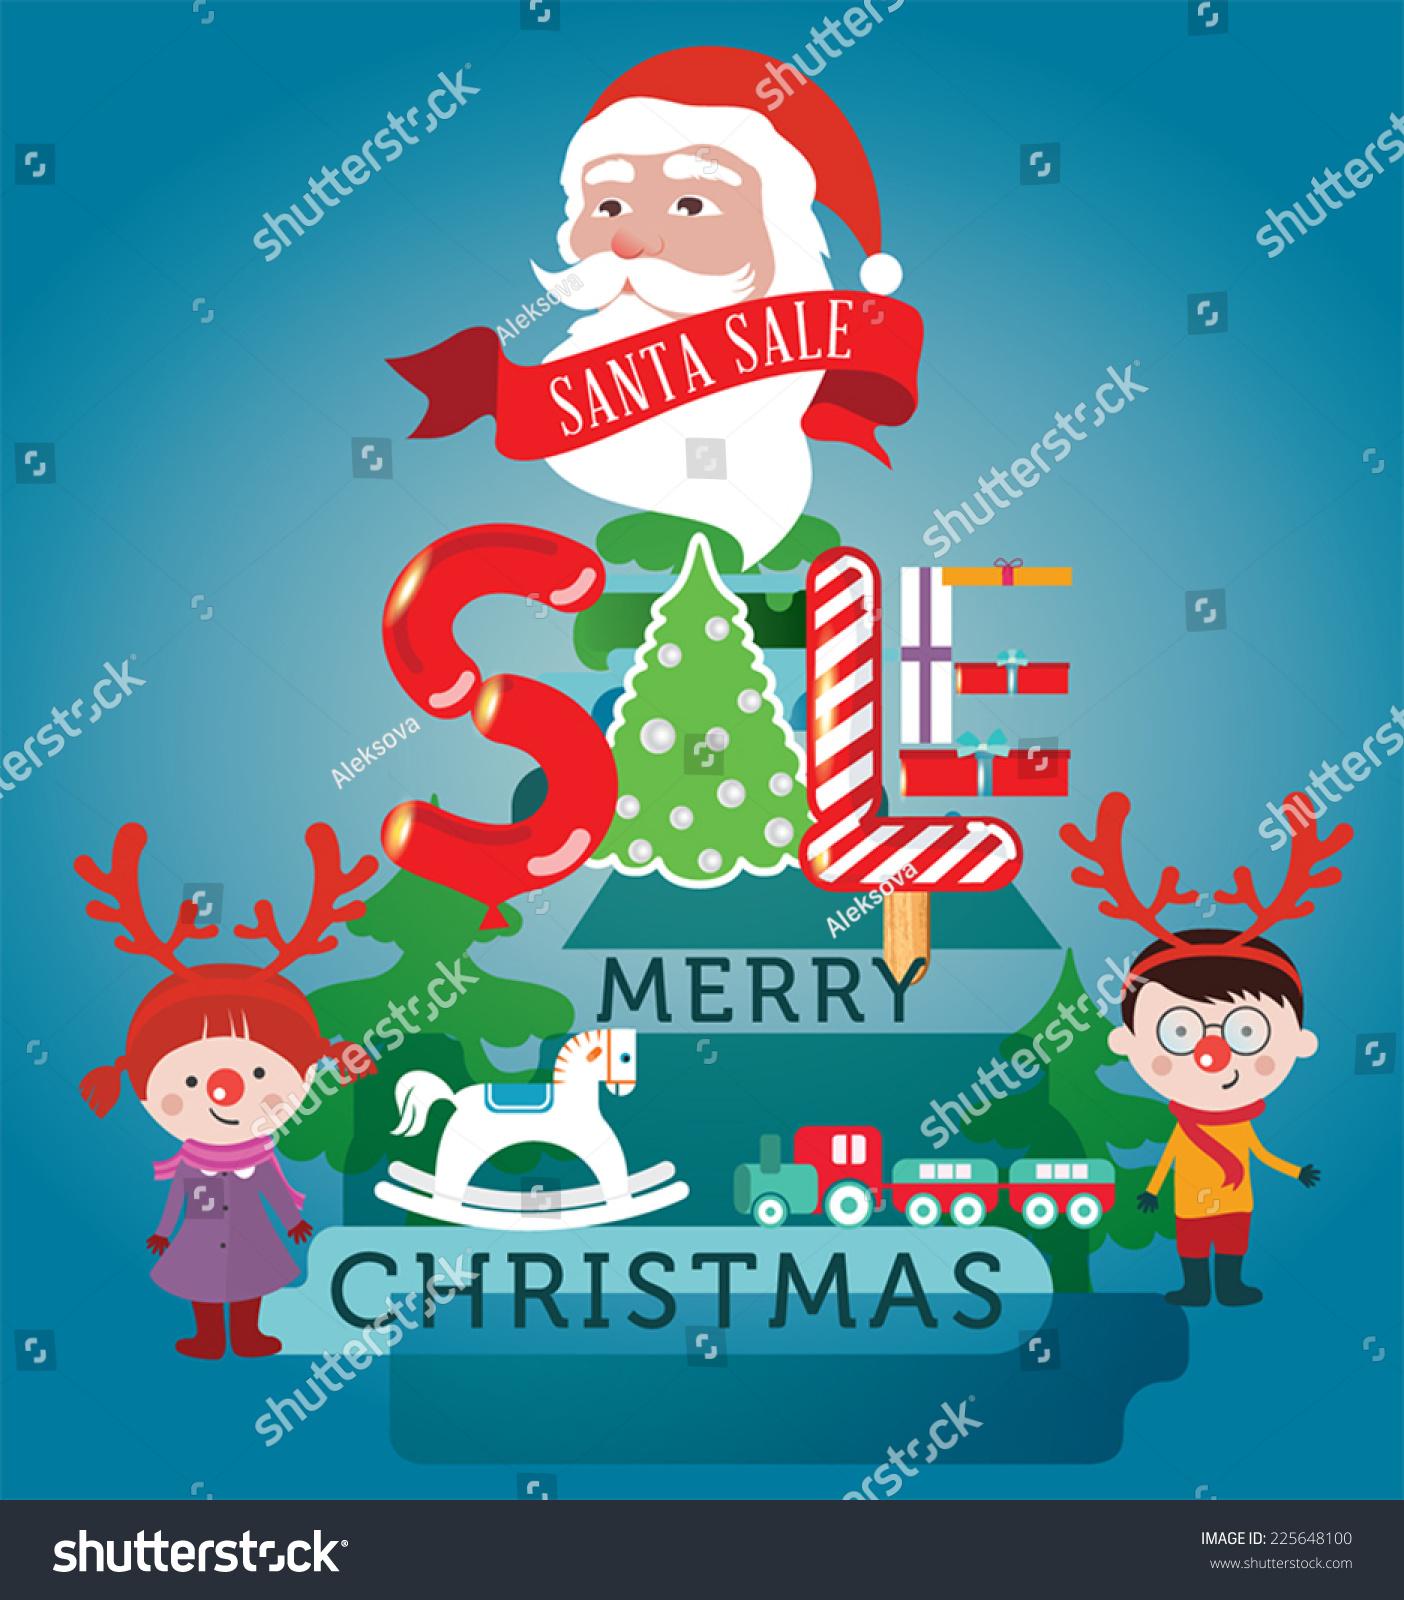 Christmas sale design template with Santa, Christmas tree and gifts ...